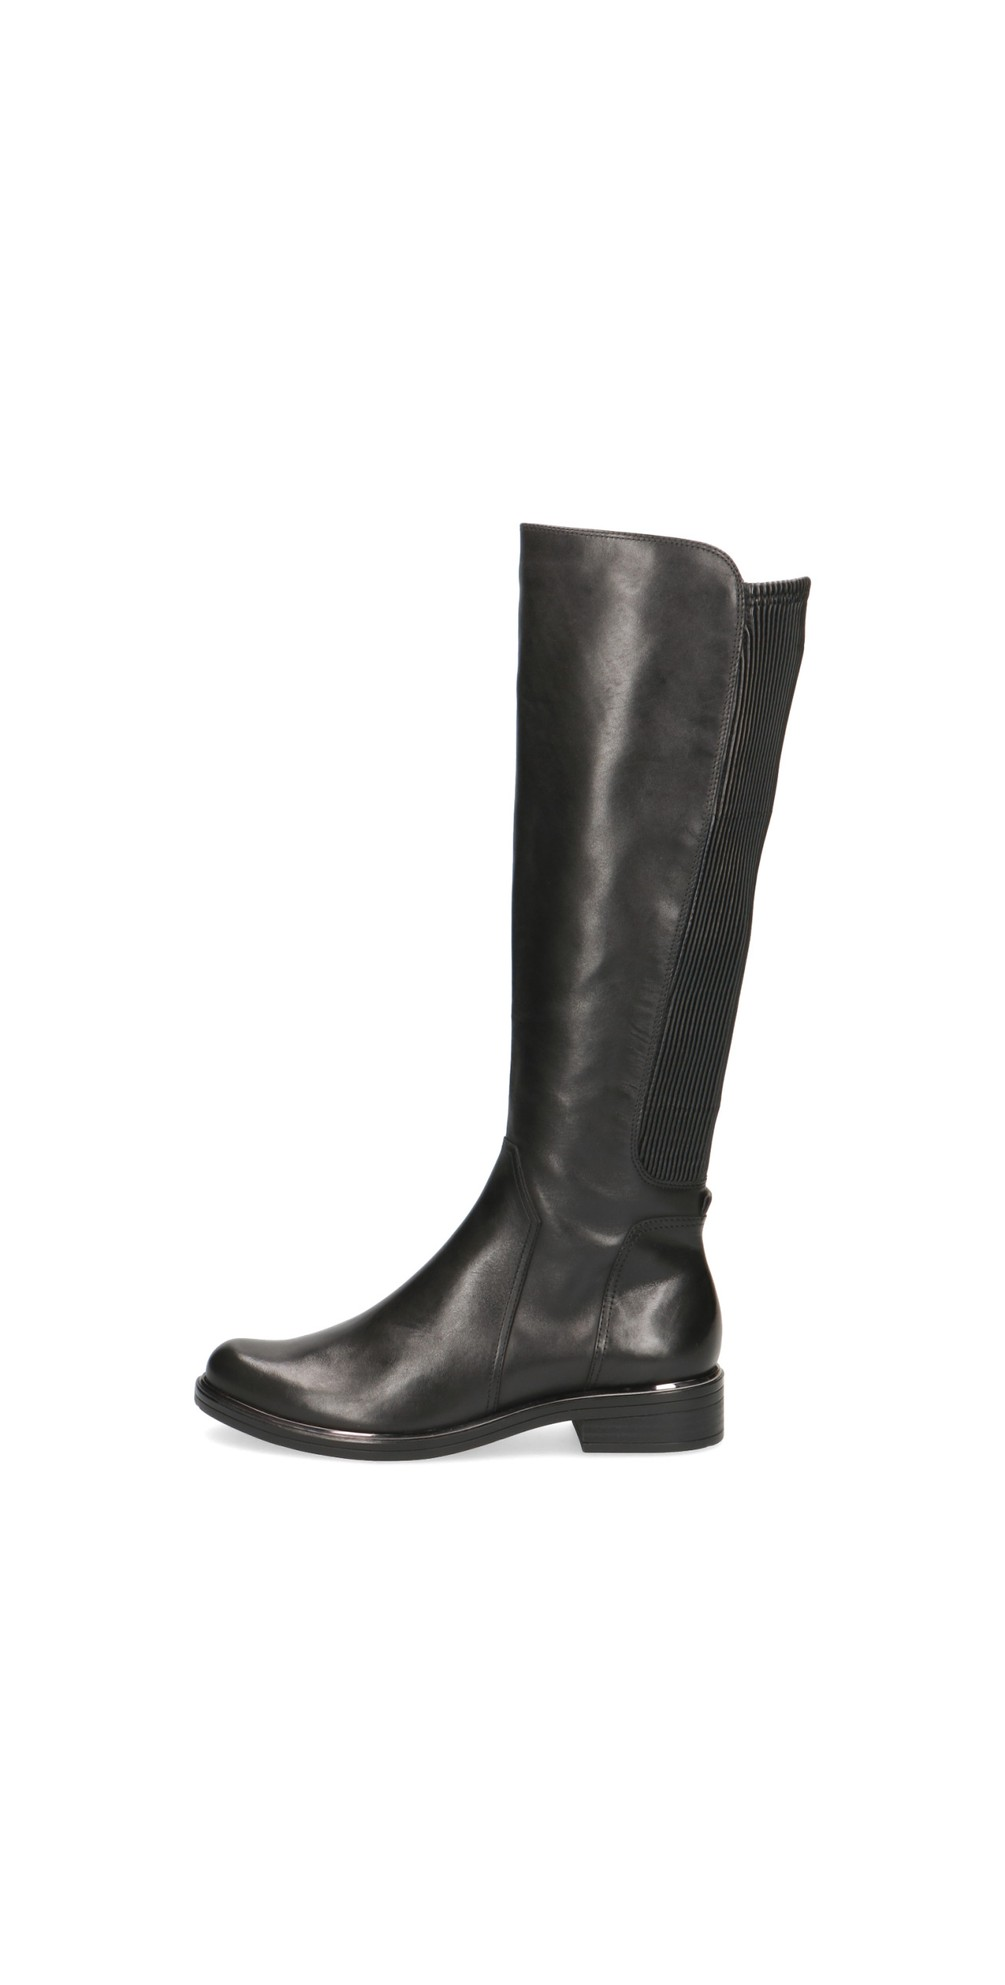 Joleen Generous Calf Fitting Leather Boot main image